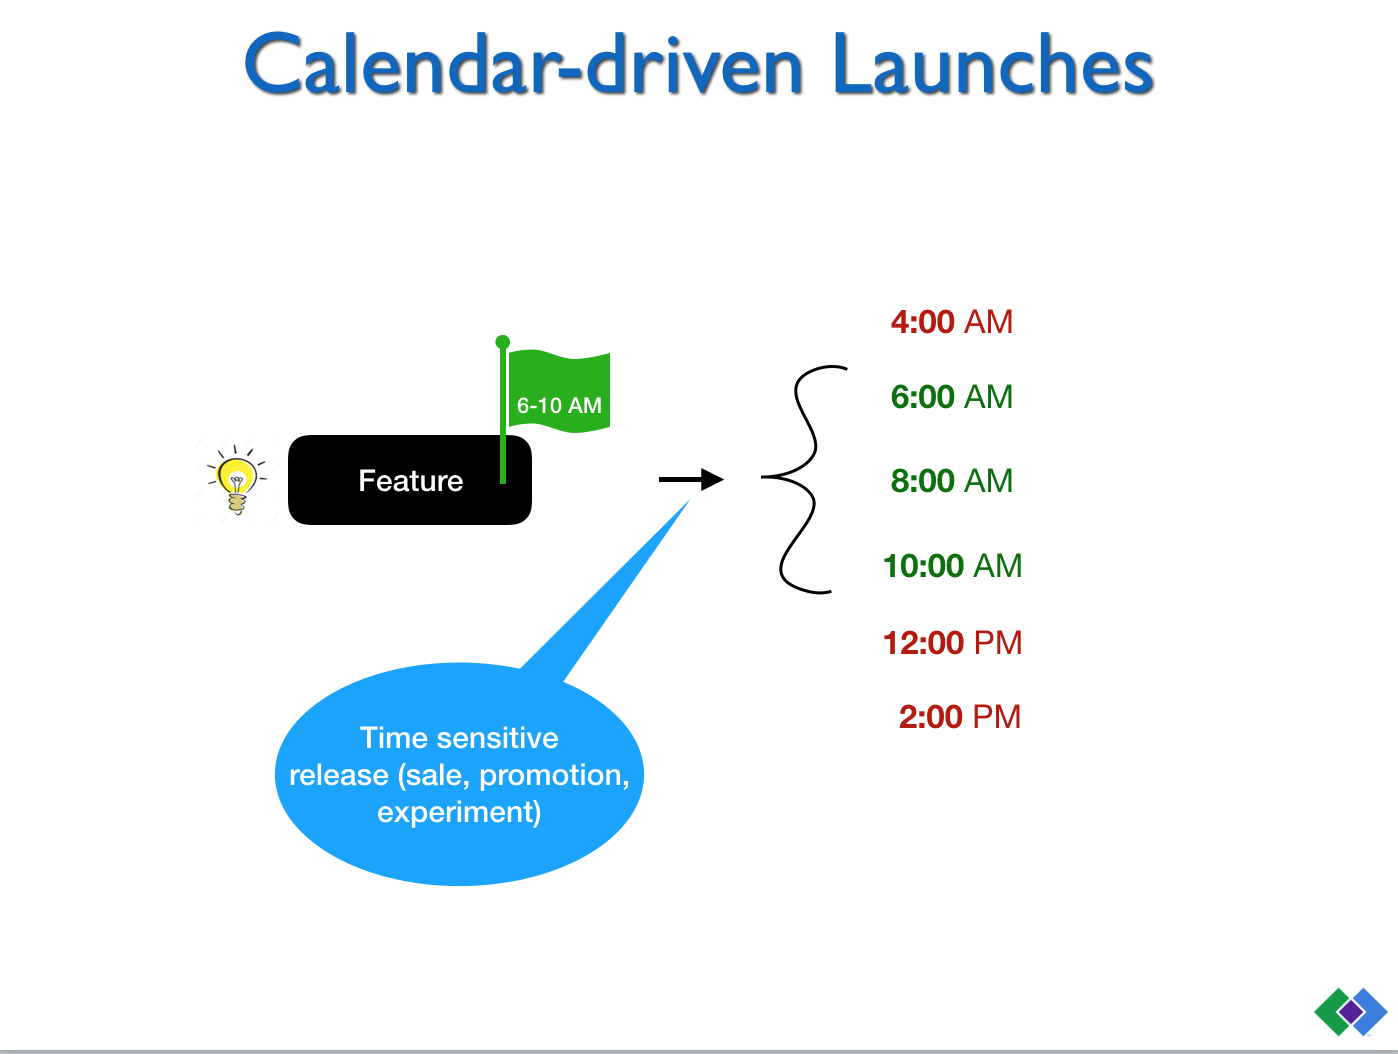 Calendar-driven Launches